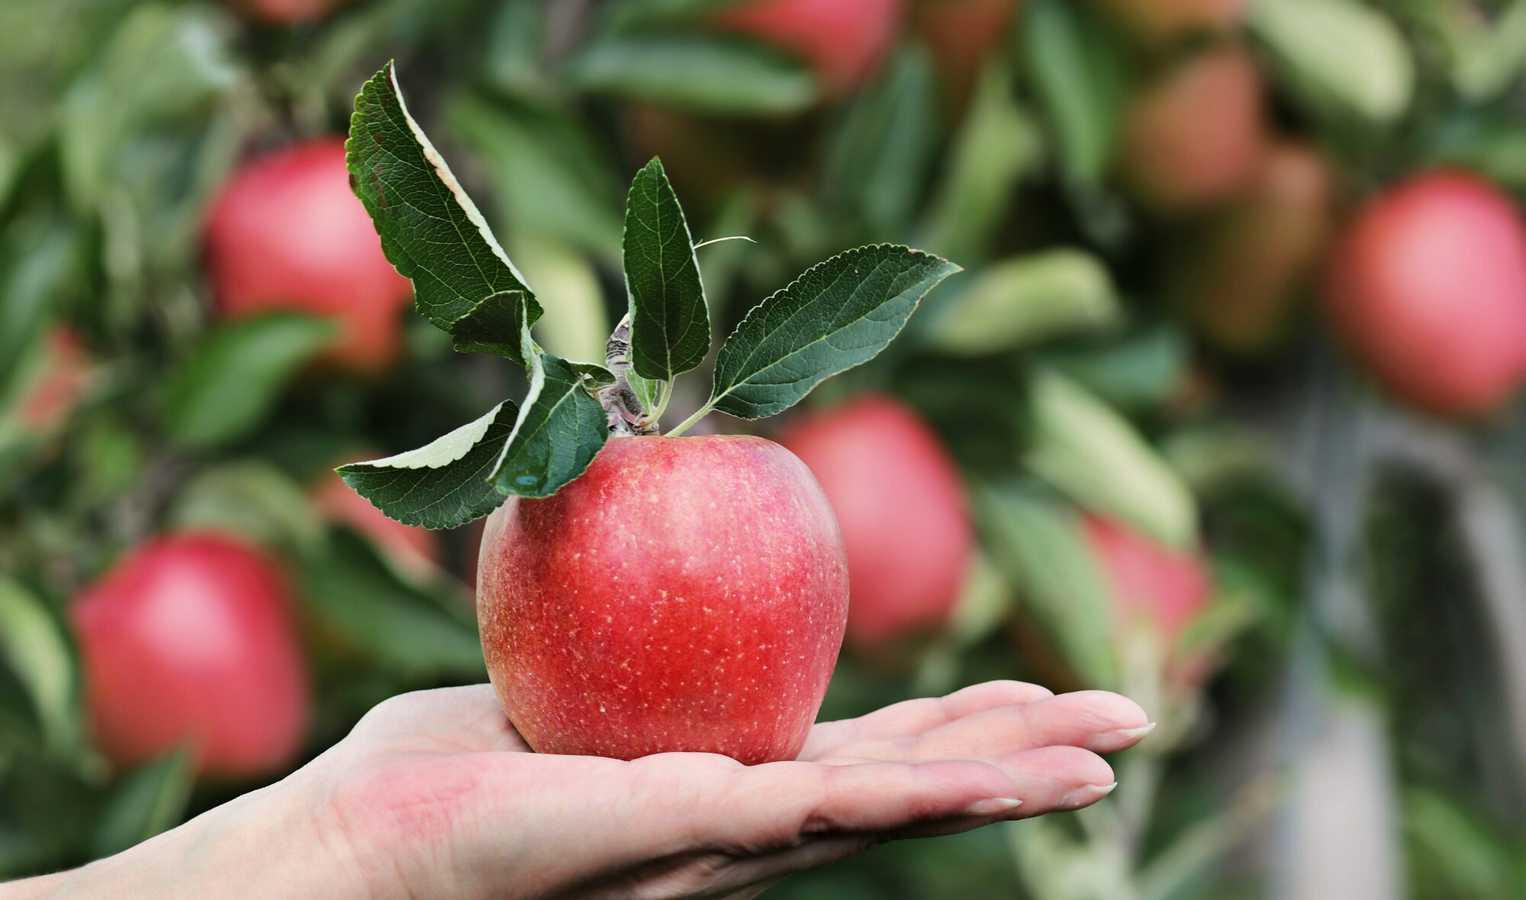 An apple sits on a hand.